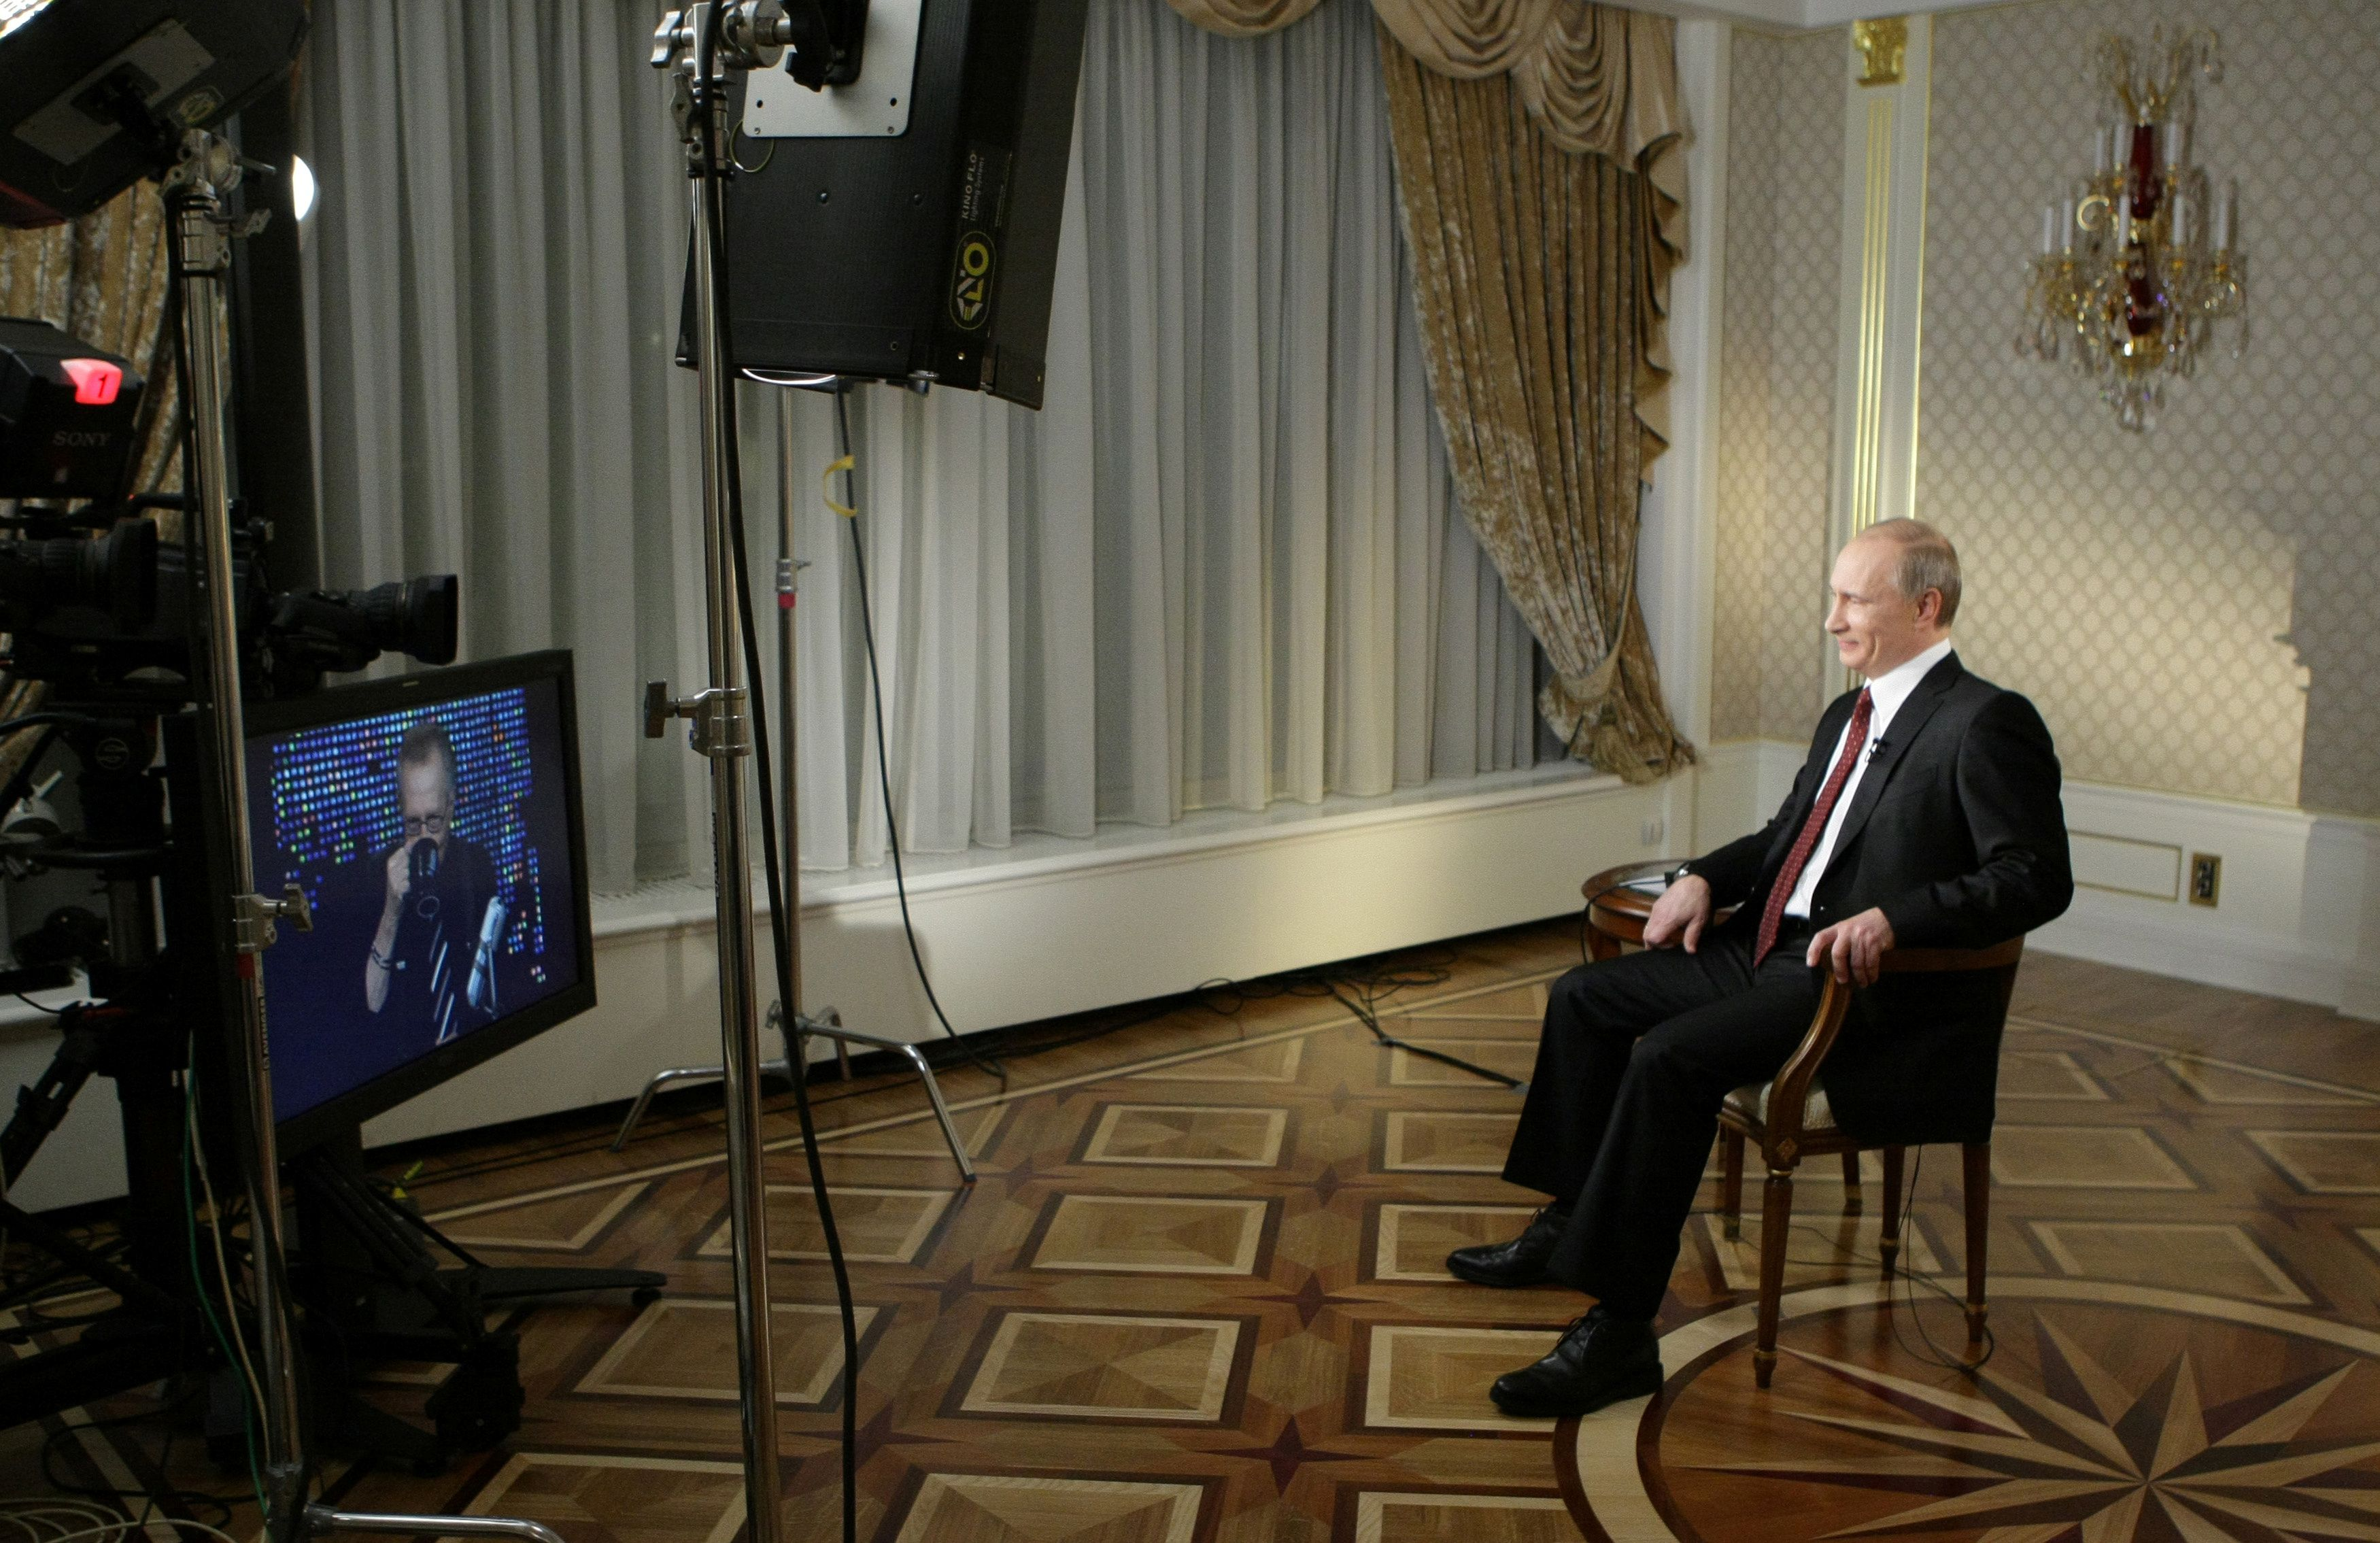 A Putin lo volvió a entrevistar el 30 de noviembre de 2010